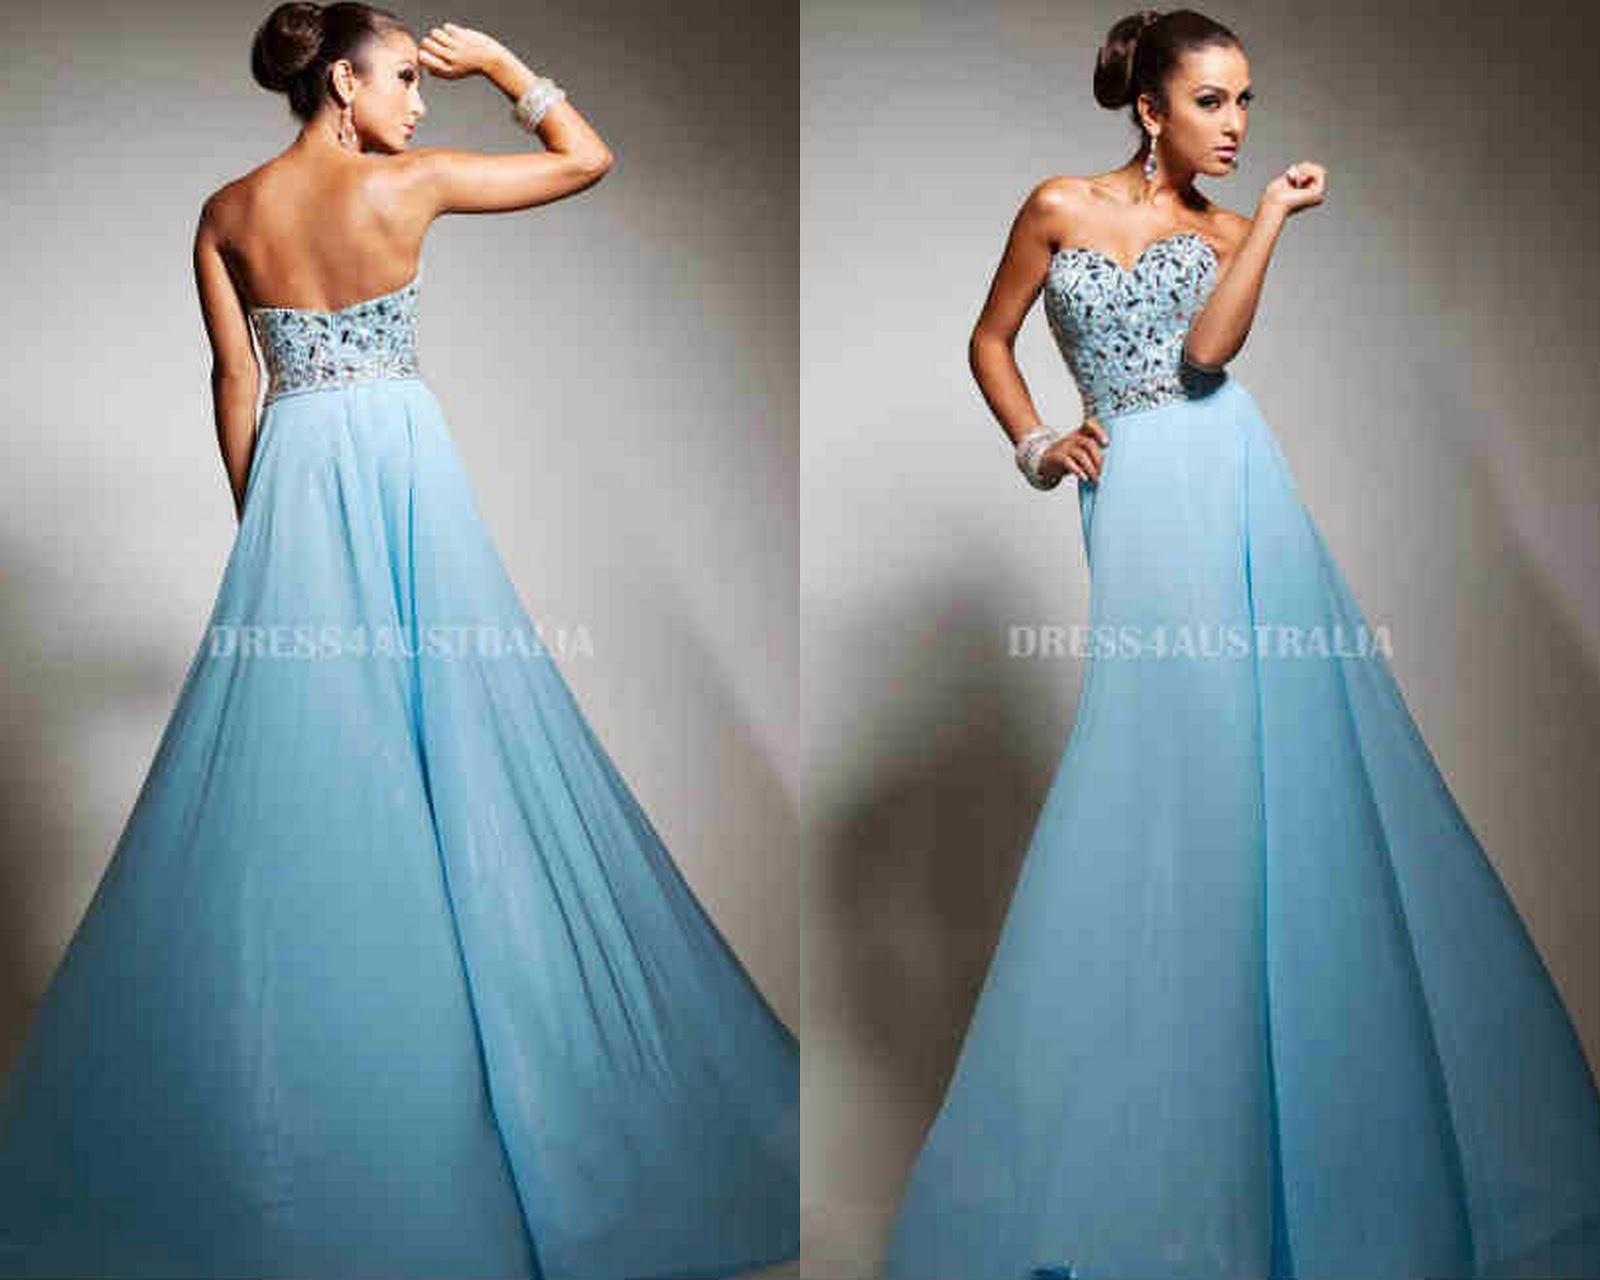 Everymomspage Choosing The Perfect Prom Dress At Dress4australia